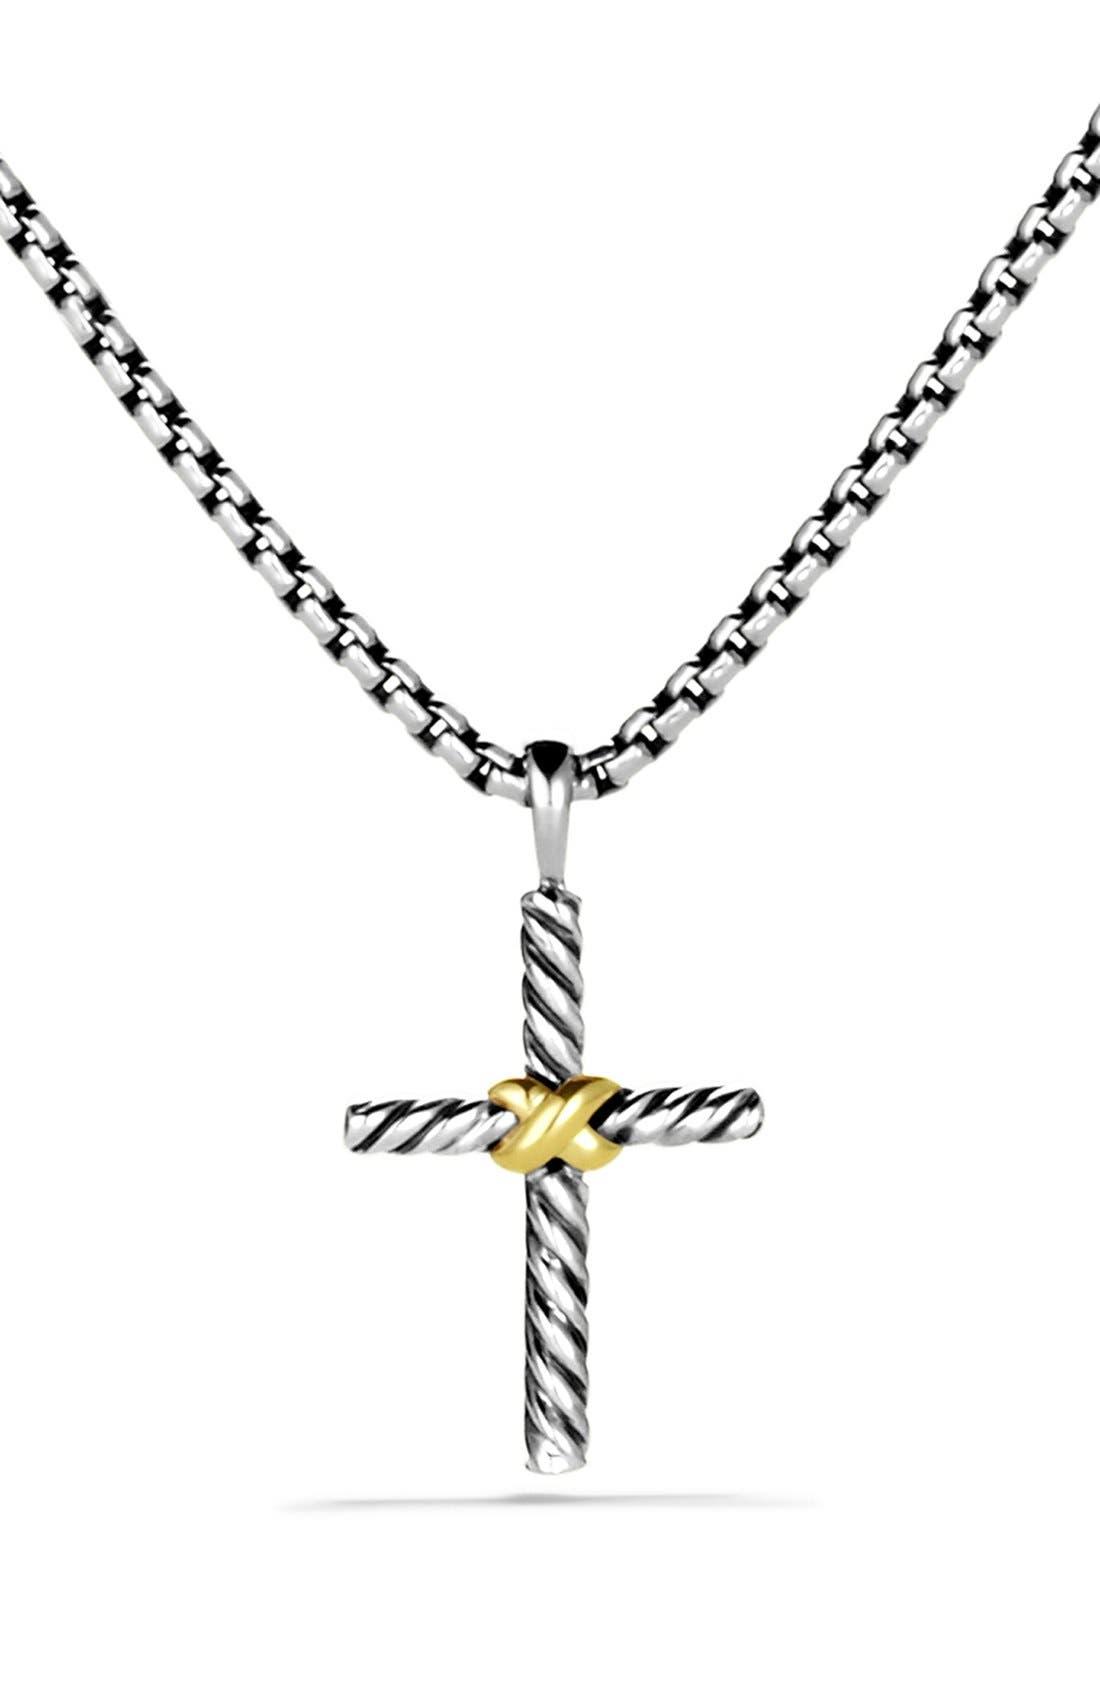 Alternate Image 1 Selected - David Yurman 'X' Cross with Gold on Chain